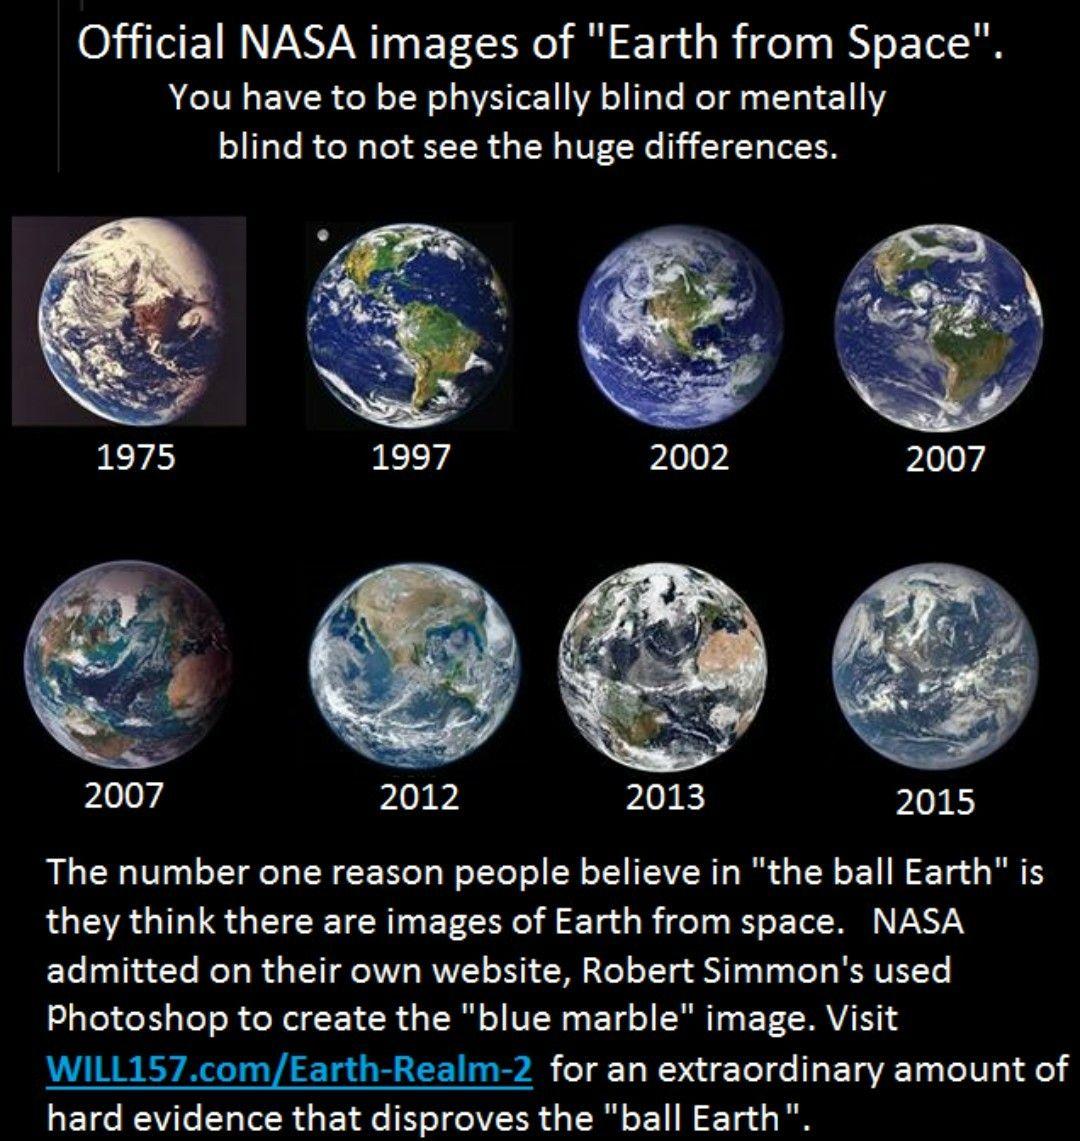 Pin By Mike Pietrofitta On Flat Earth Nasa Lies Flat Earth Flat Earth Theory Earth From Space